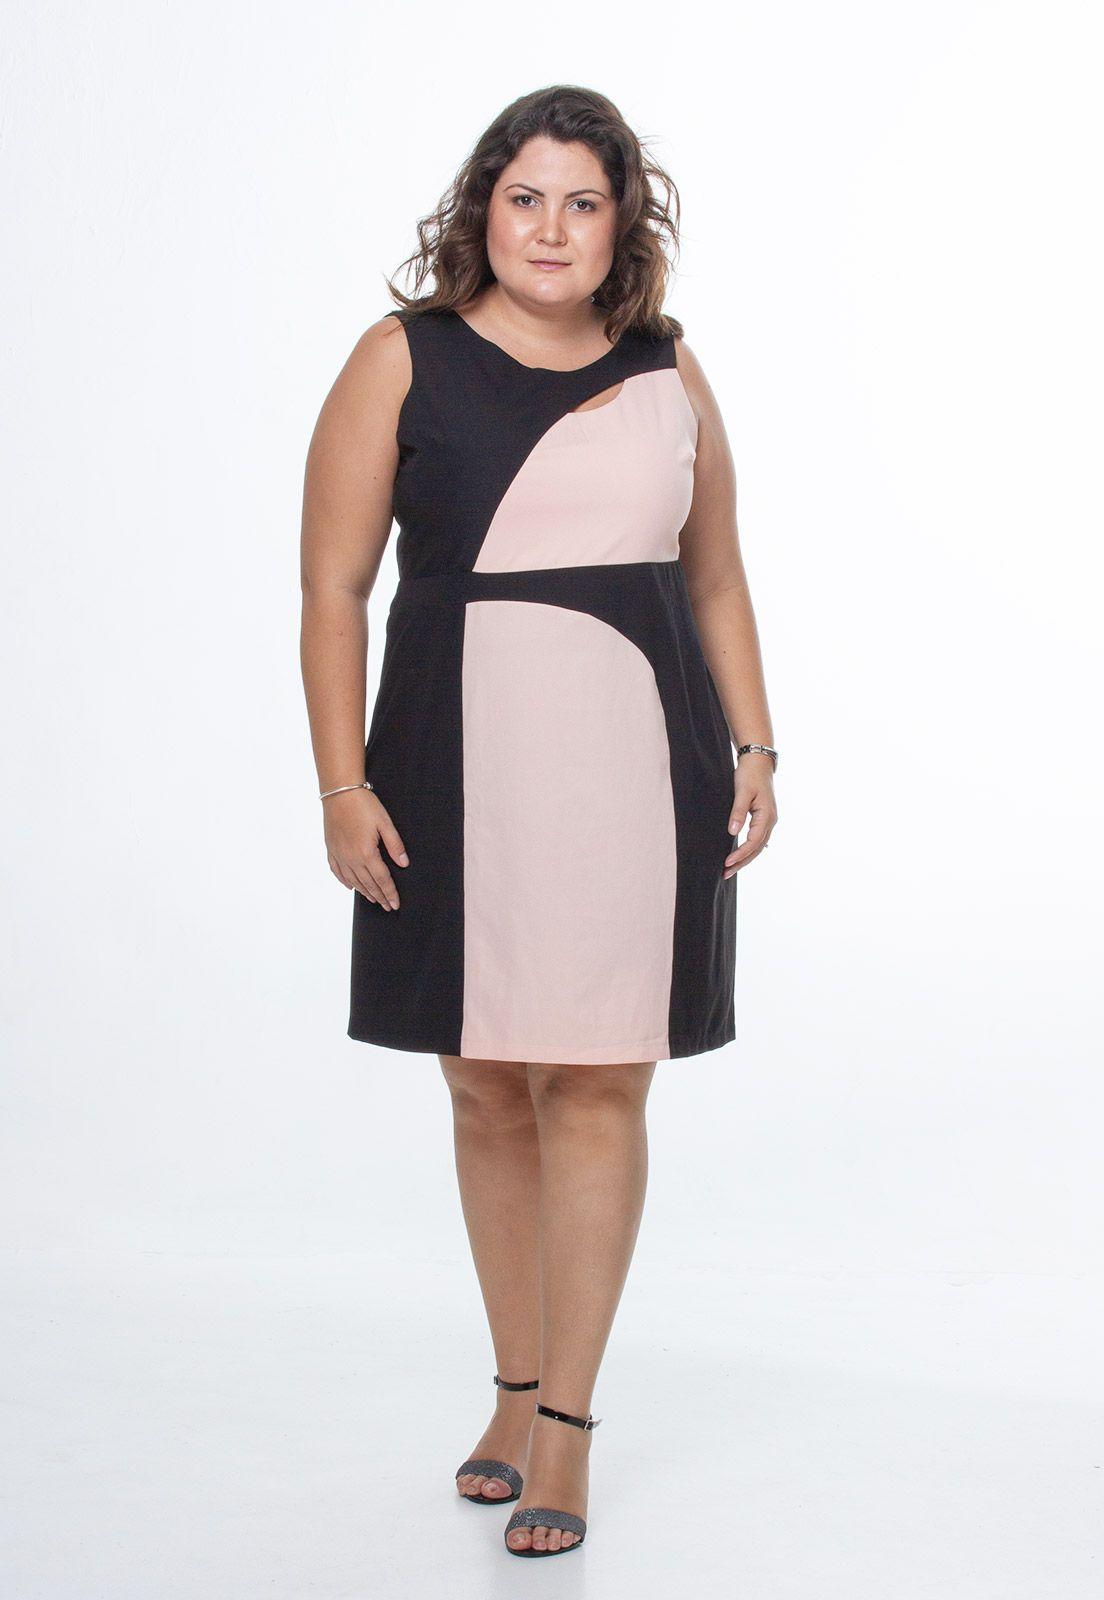 Vestido tubinho com recorte preto e rosa plus size